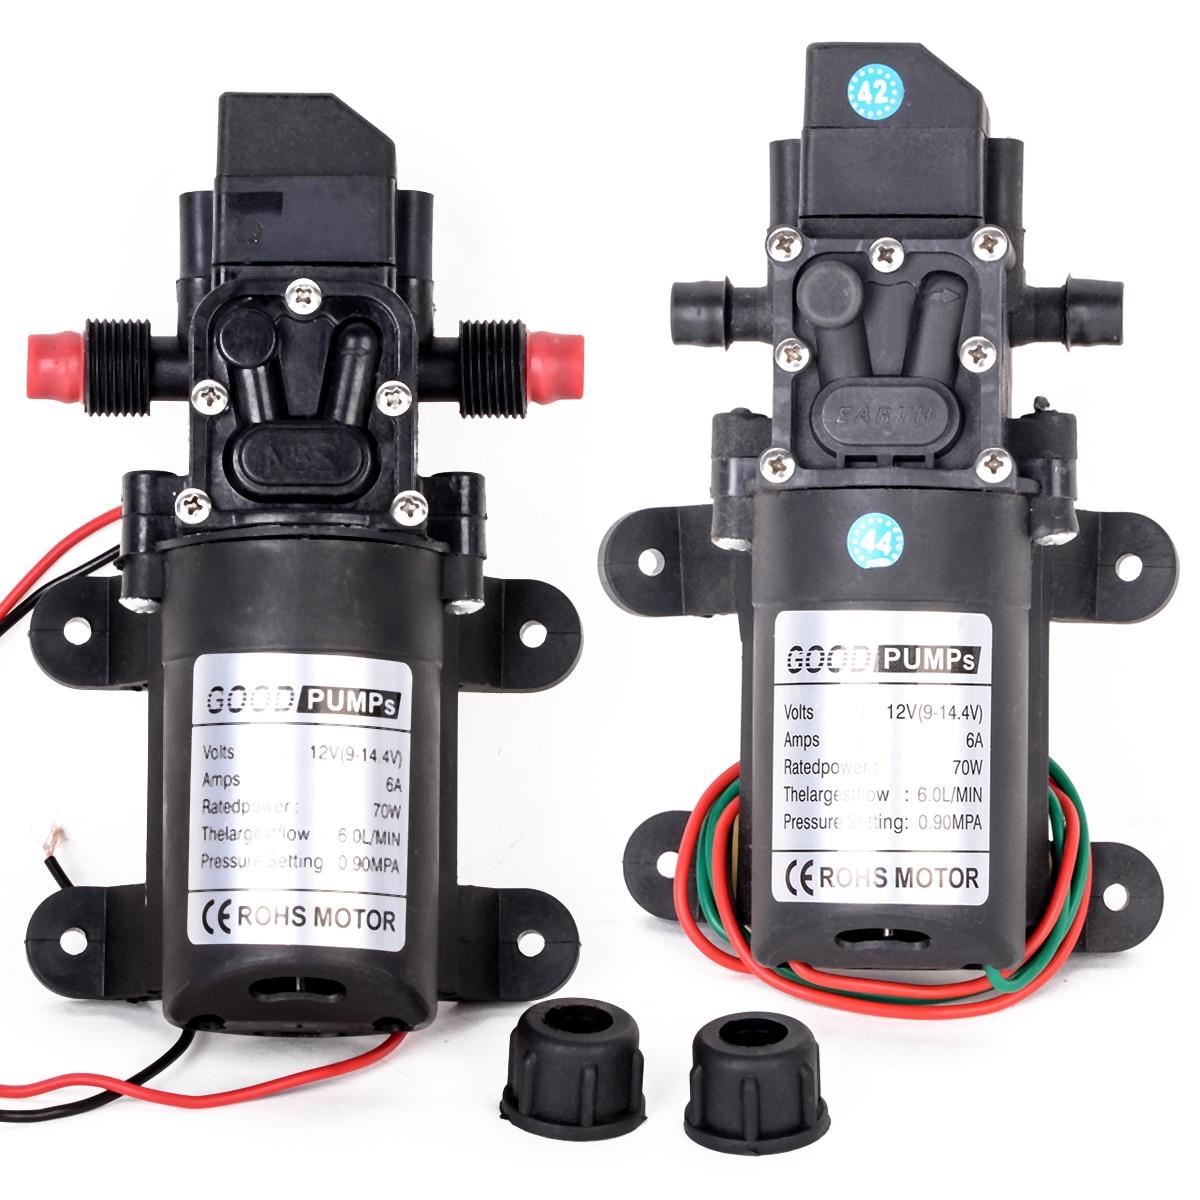 New Mini Diaphragm Water Pump DC12V 70W 130PSI 6L/Min Water High Pressure Diaphragm Self Priming Pump For Electric Car Washing цена 2017